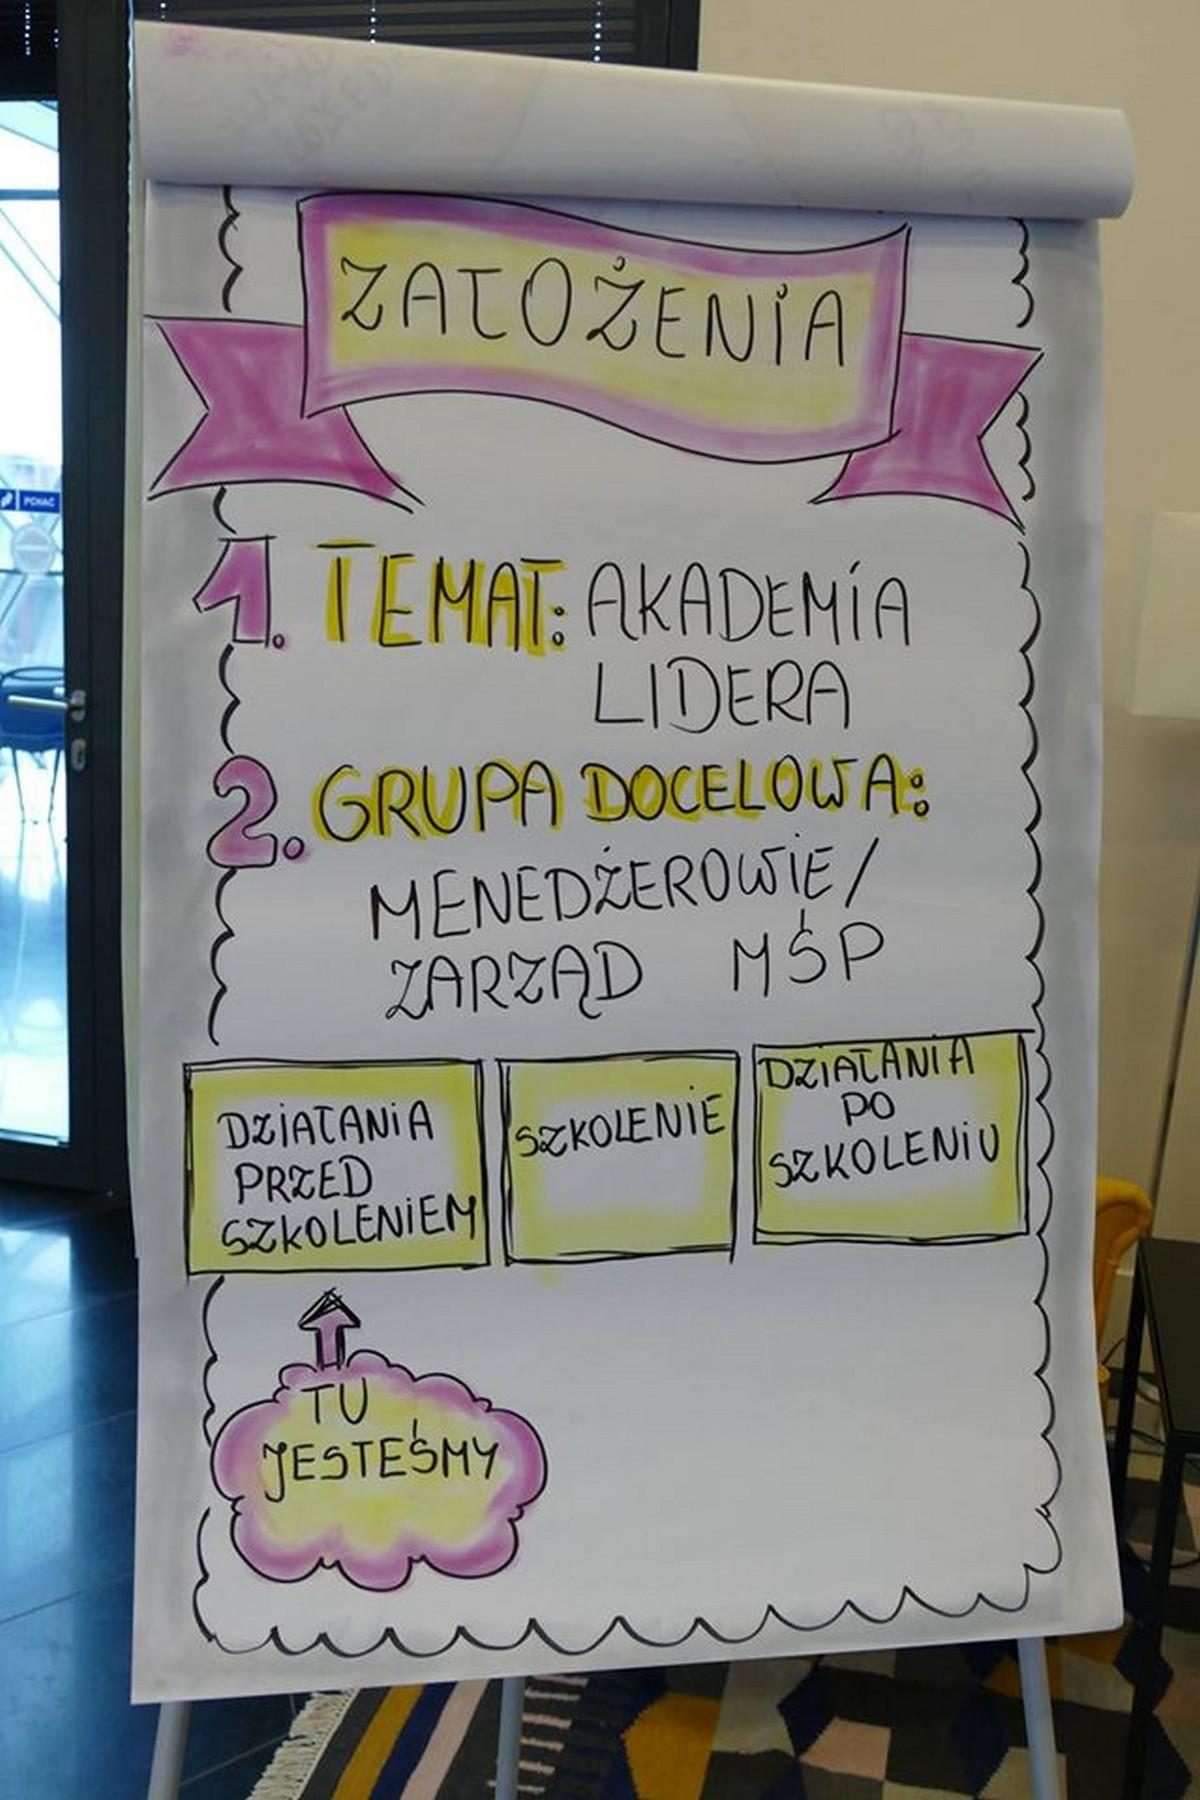 official_eleganse_strona_szkolenia_marta_debowiec_2_024